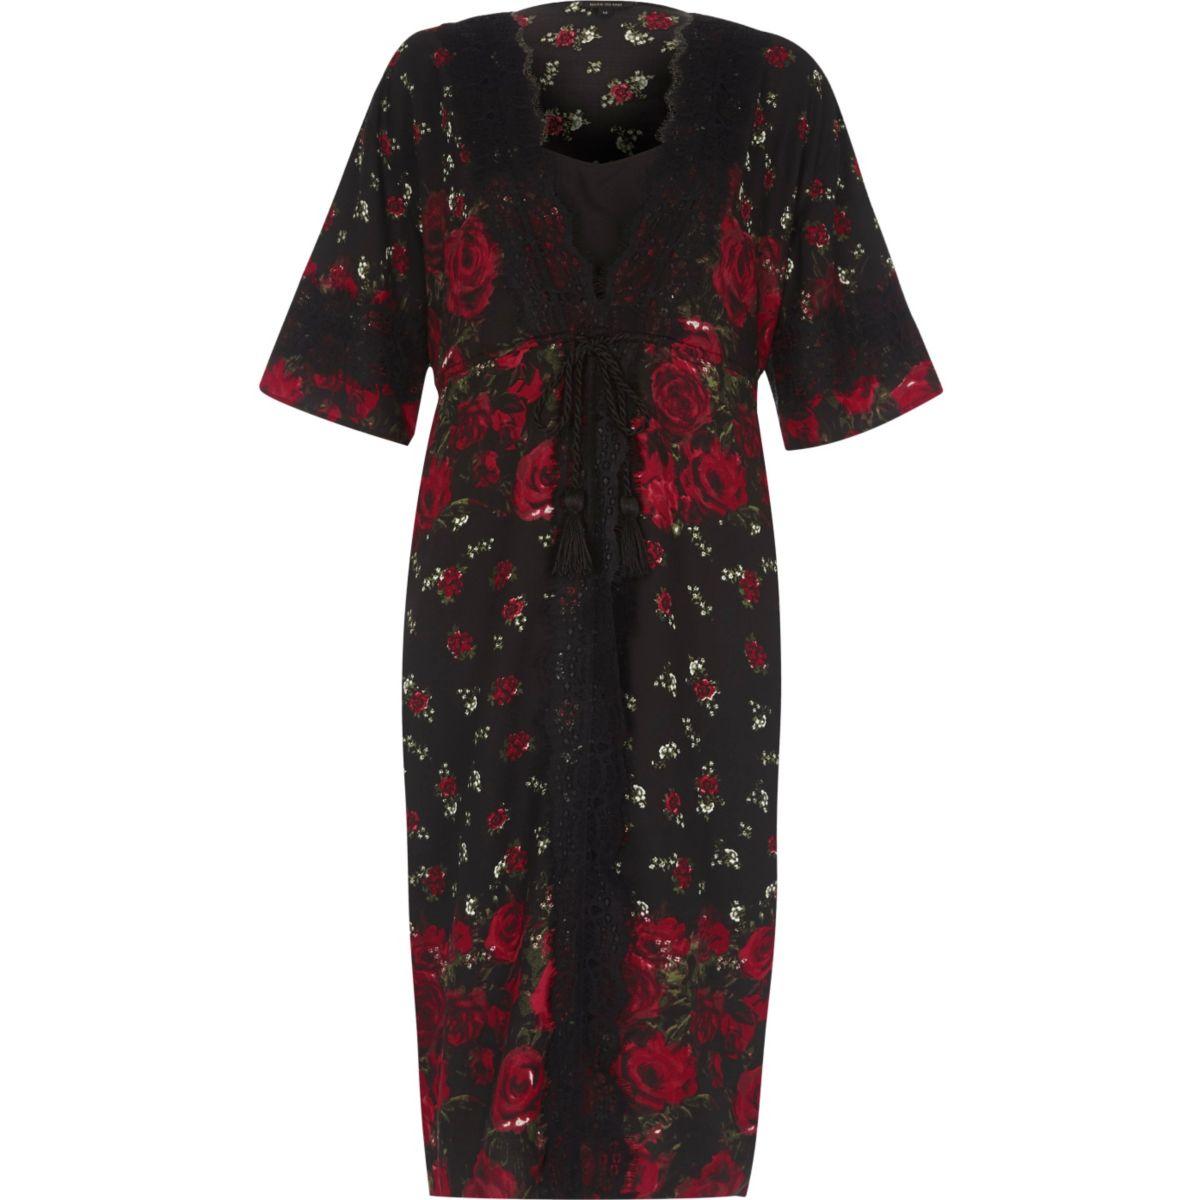 Black floral rose print layered kimono dress